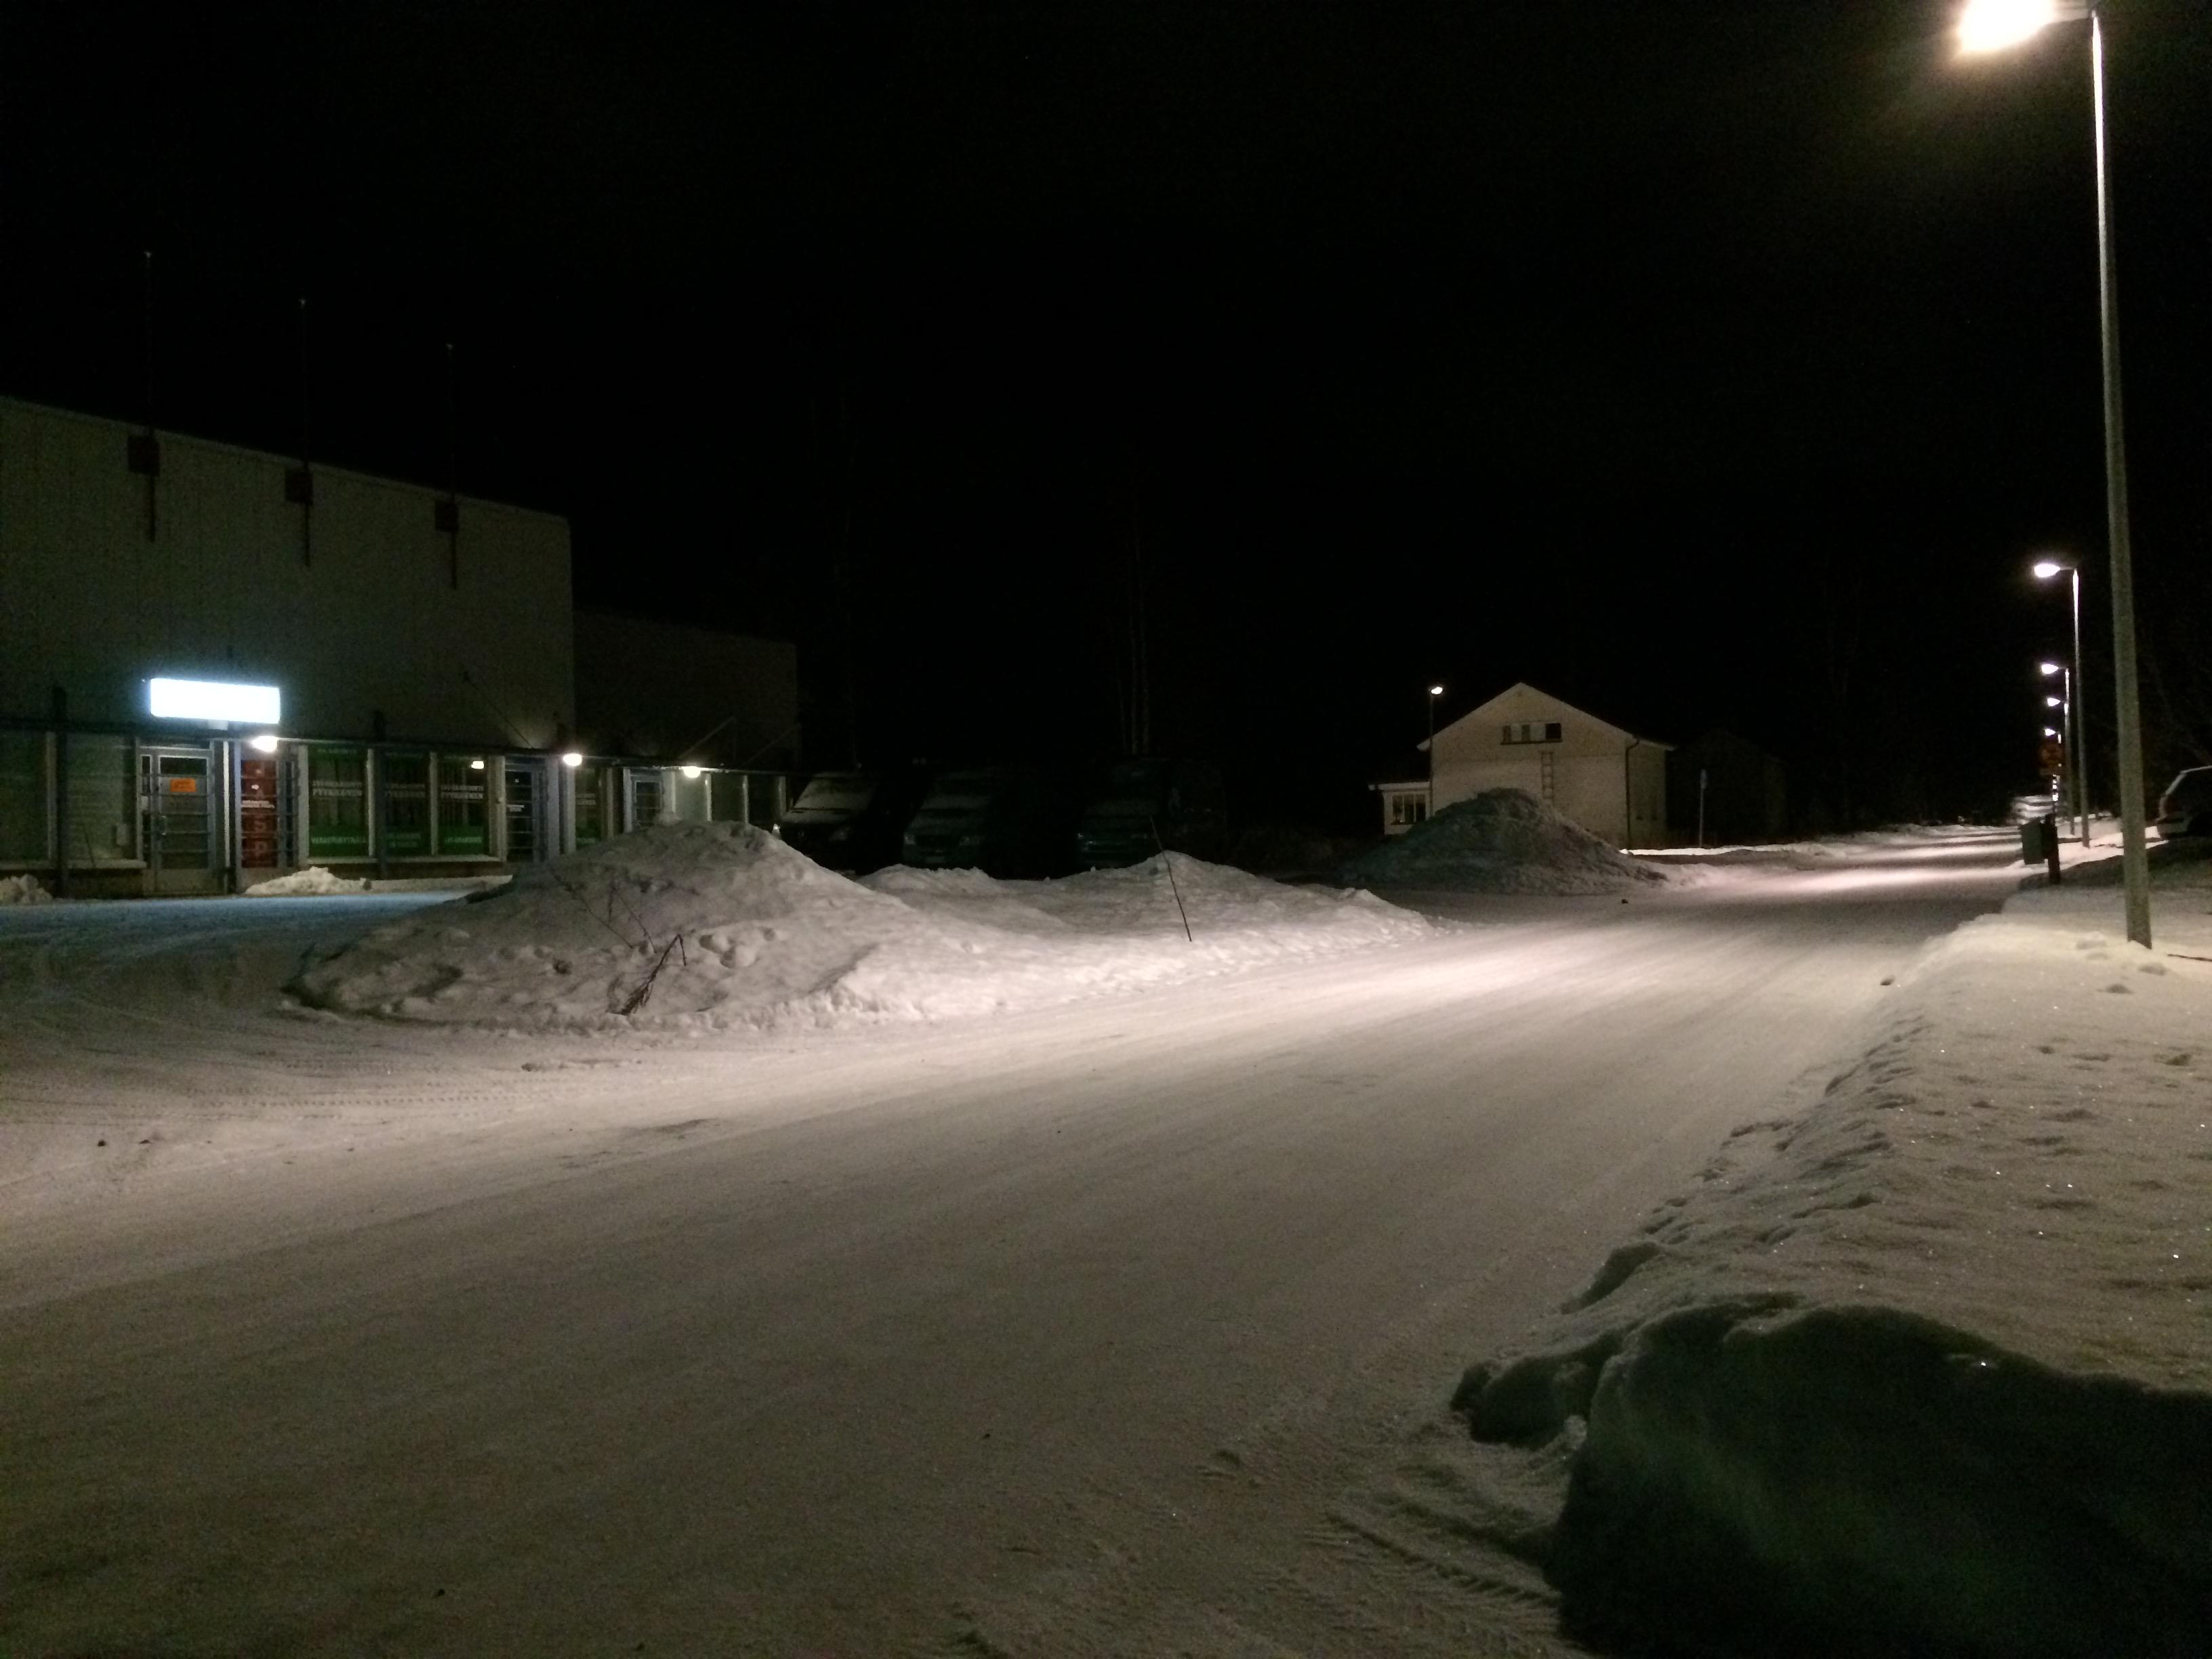 005 A Little More Snow